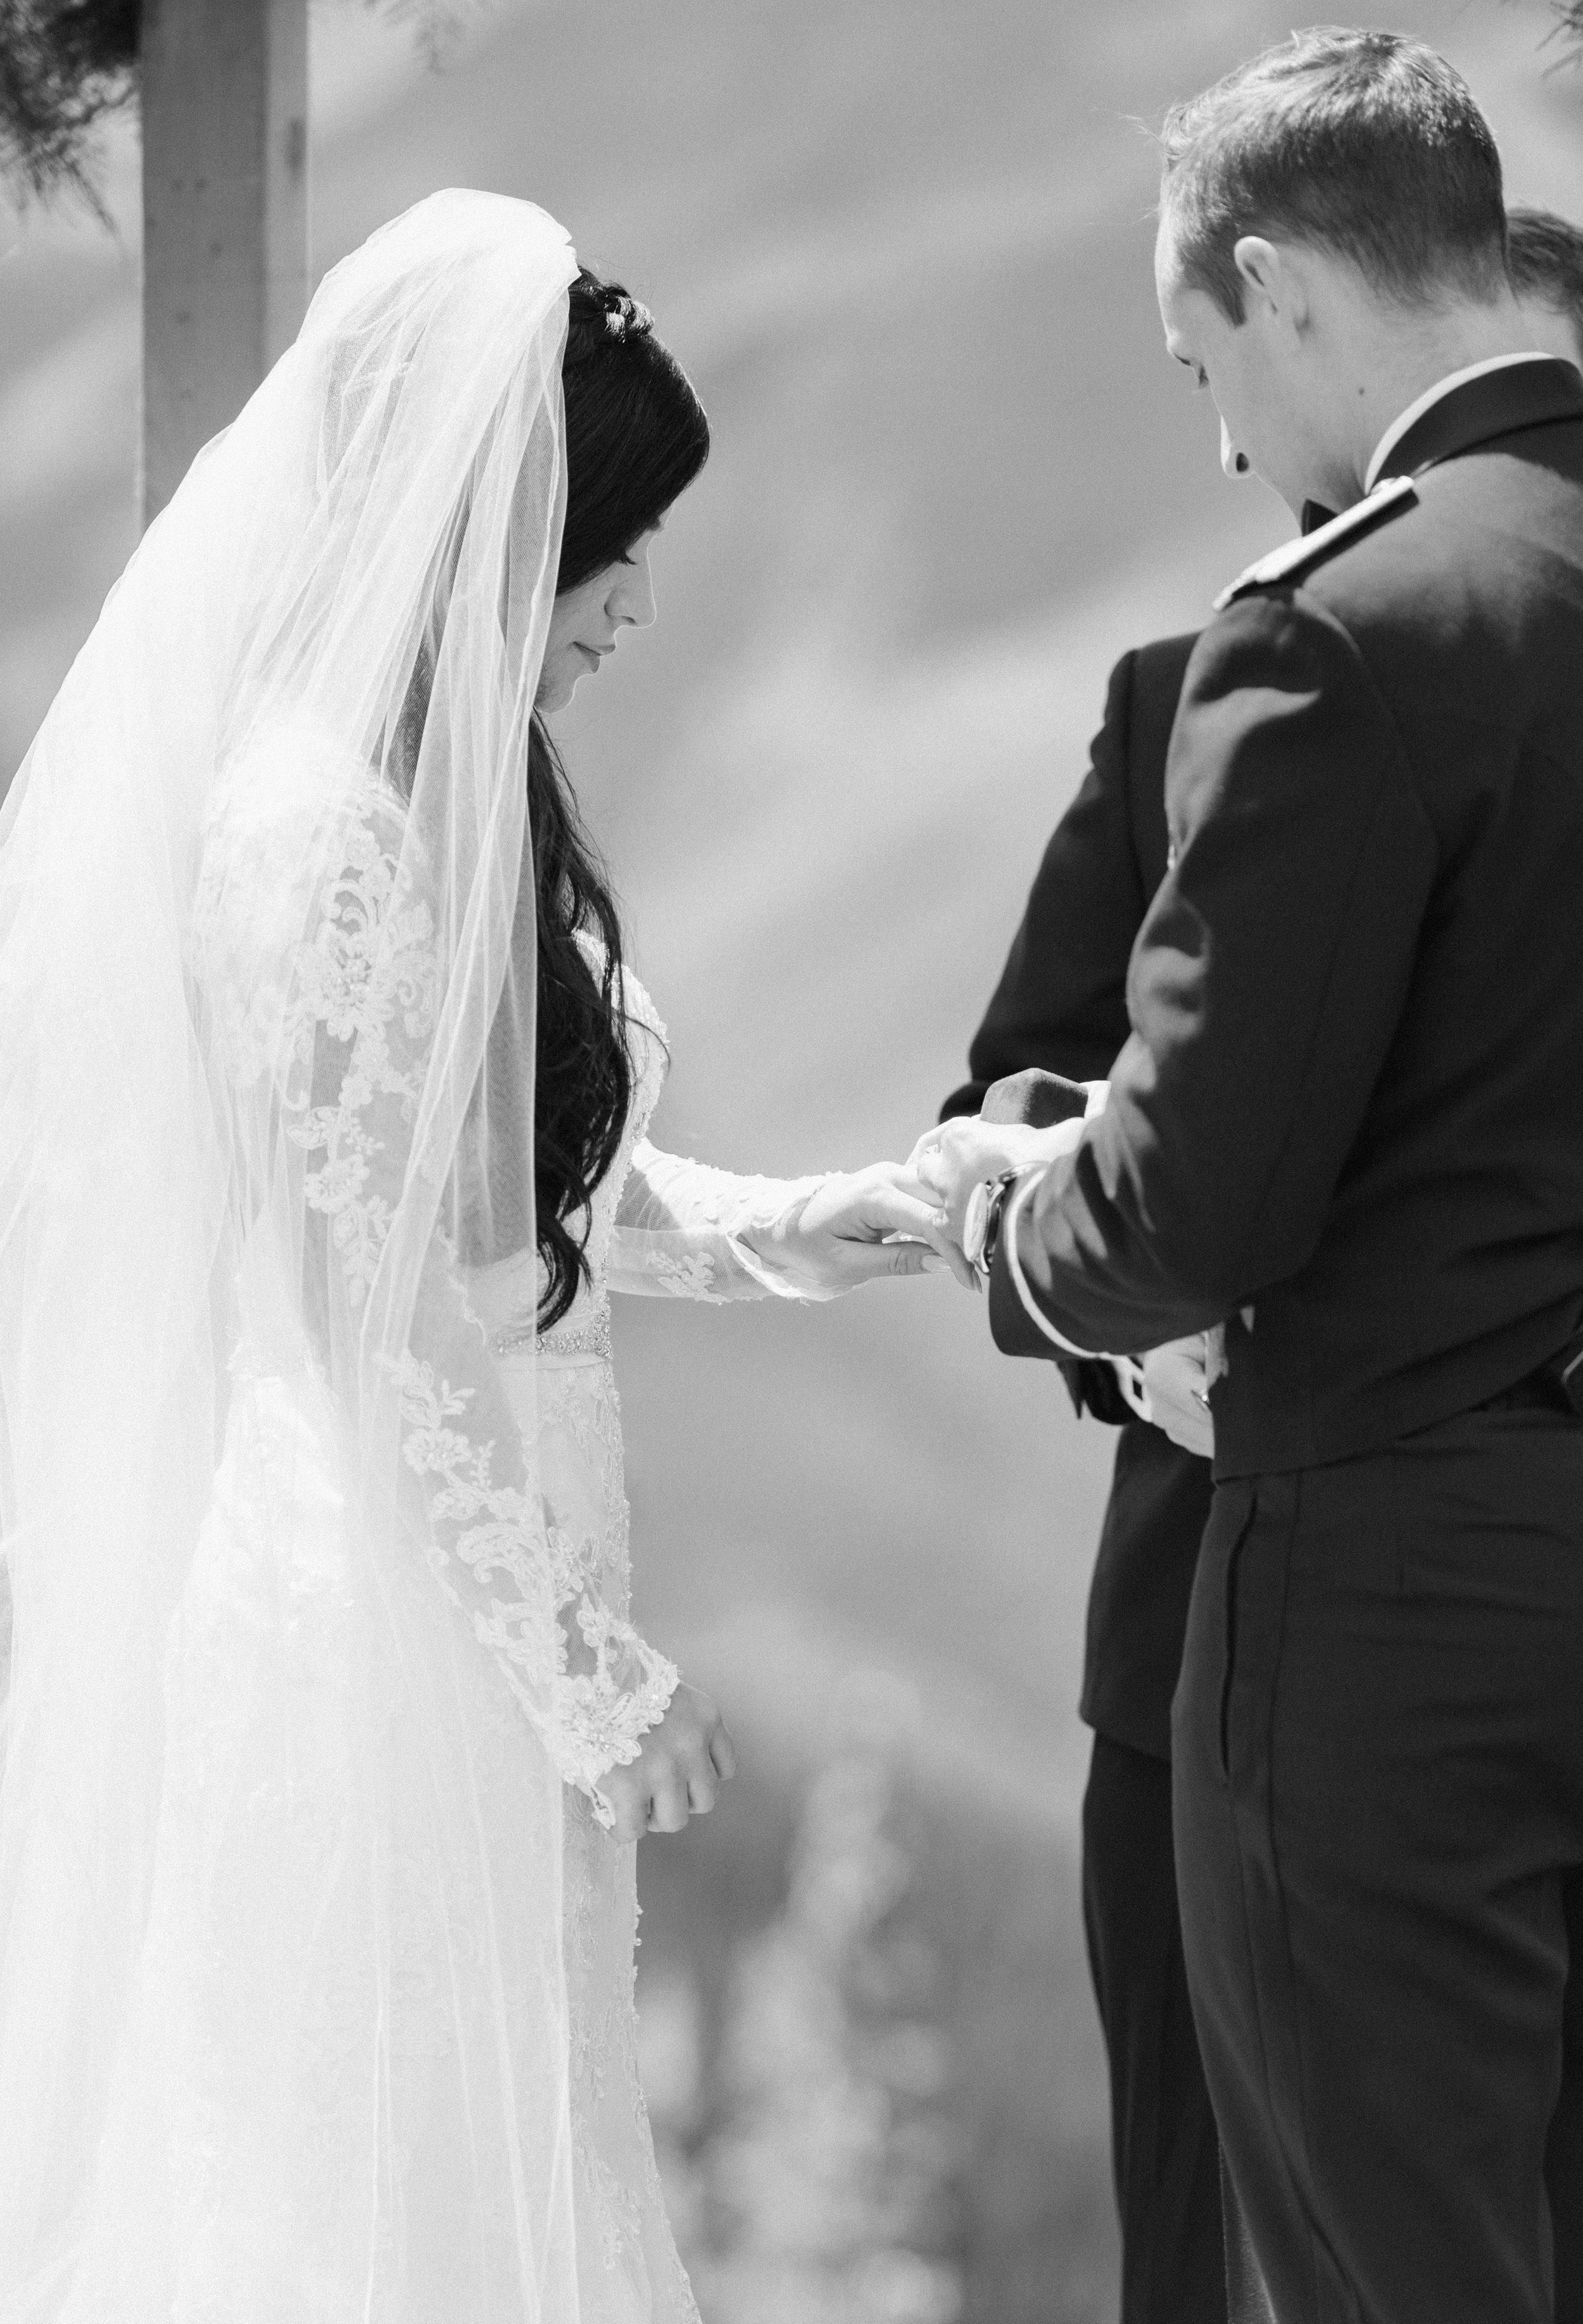 Aspen Colorado Wedding- The Little Nell - Carrie King Photographer-006.jpg